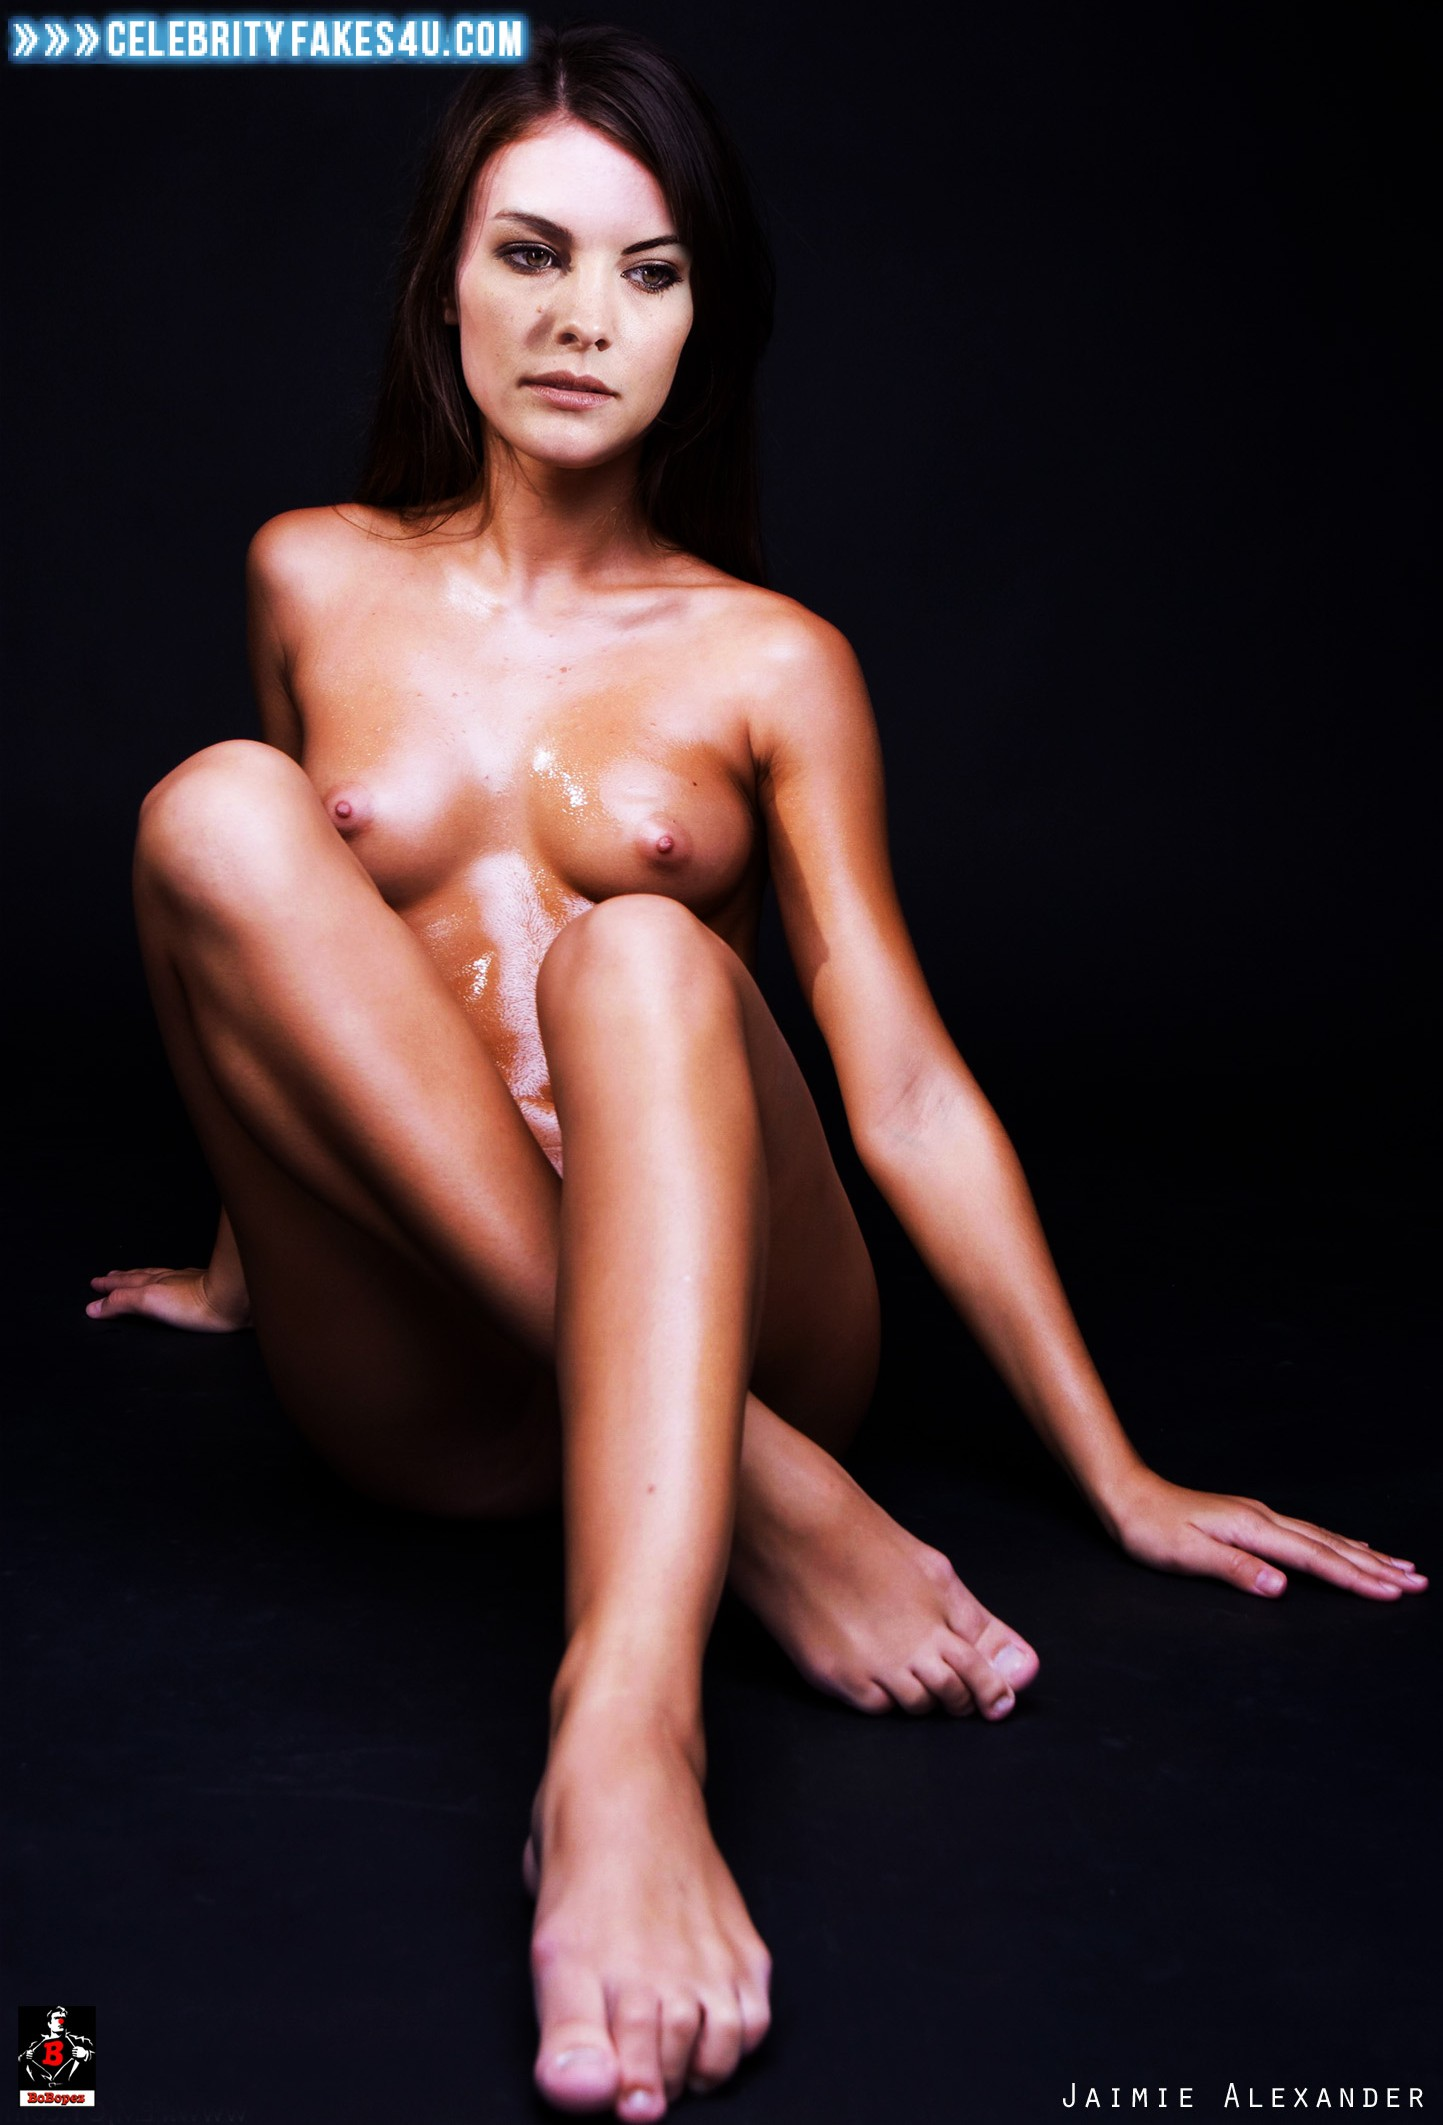 Jaimie alexander panties nude #3